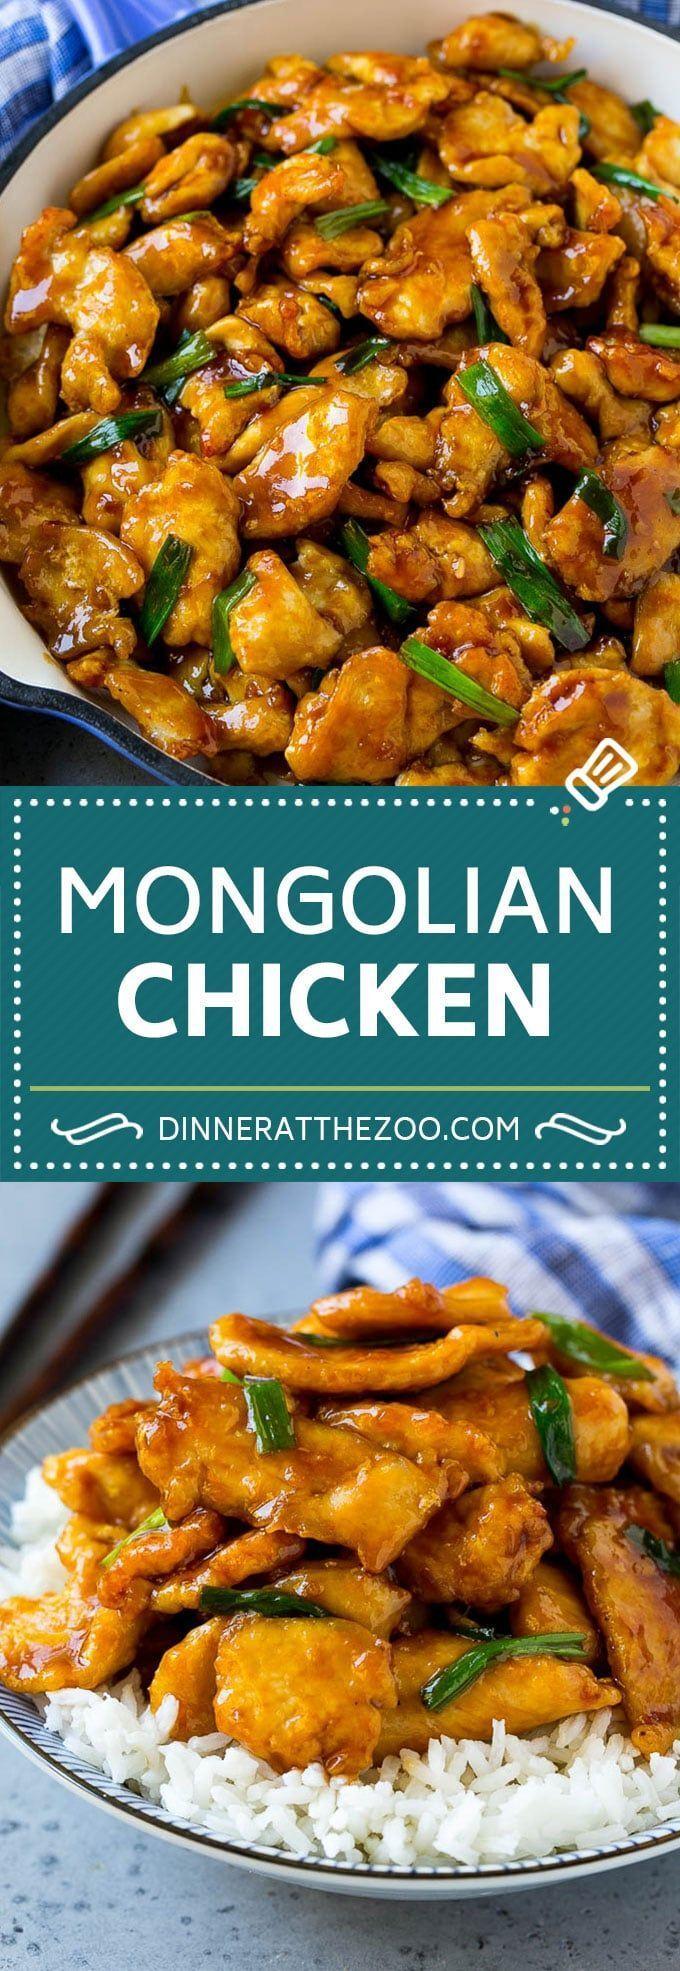 Mongolian Chicken Recipe   Chicken Stir Fry   Asian Chicken #chicken #stirfry #asian #dinner #dinneratthezoo